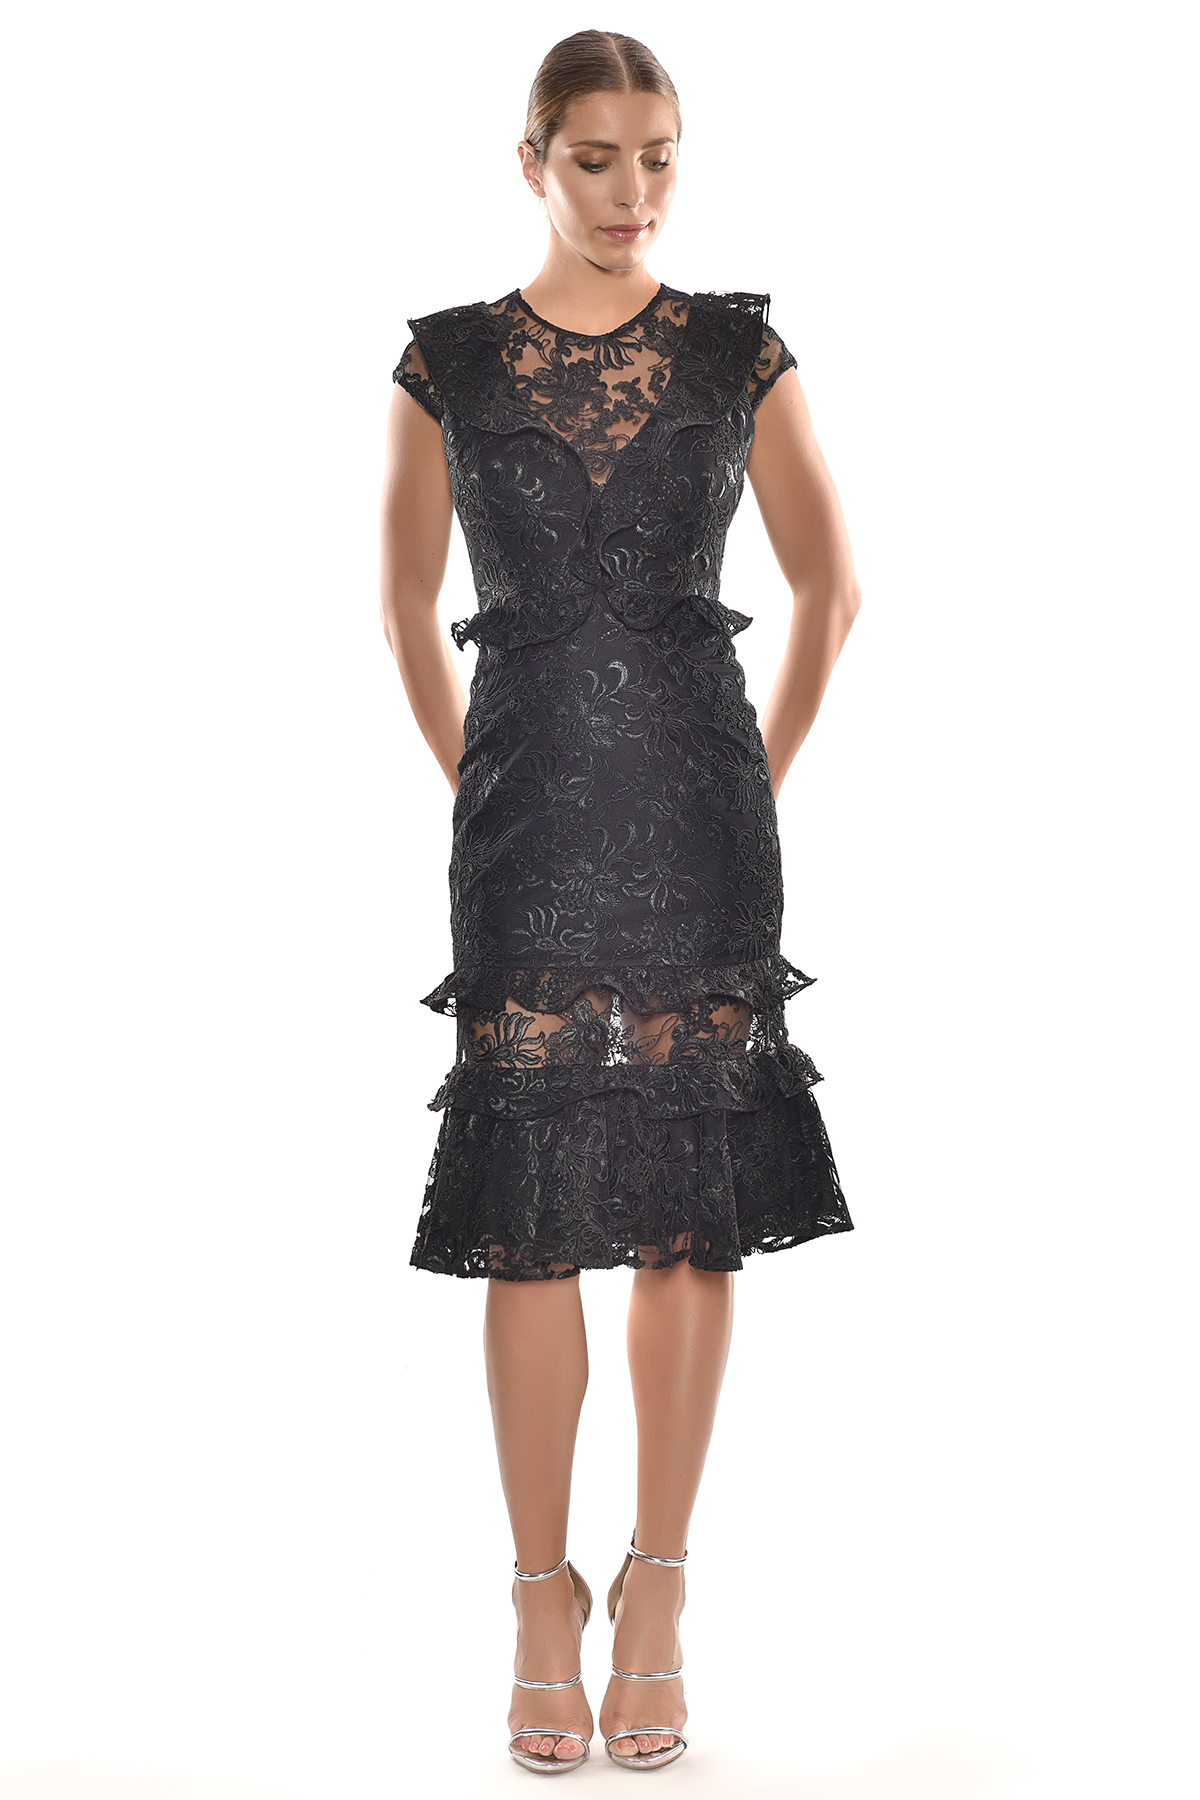 Alfa Beta - Siyah Dantel İşlemeli Kap Kol Midi Boy Elbise